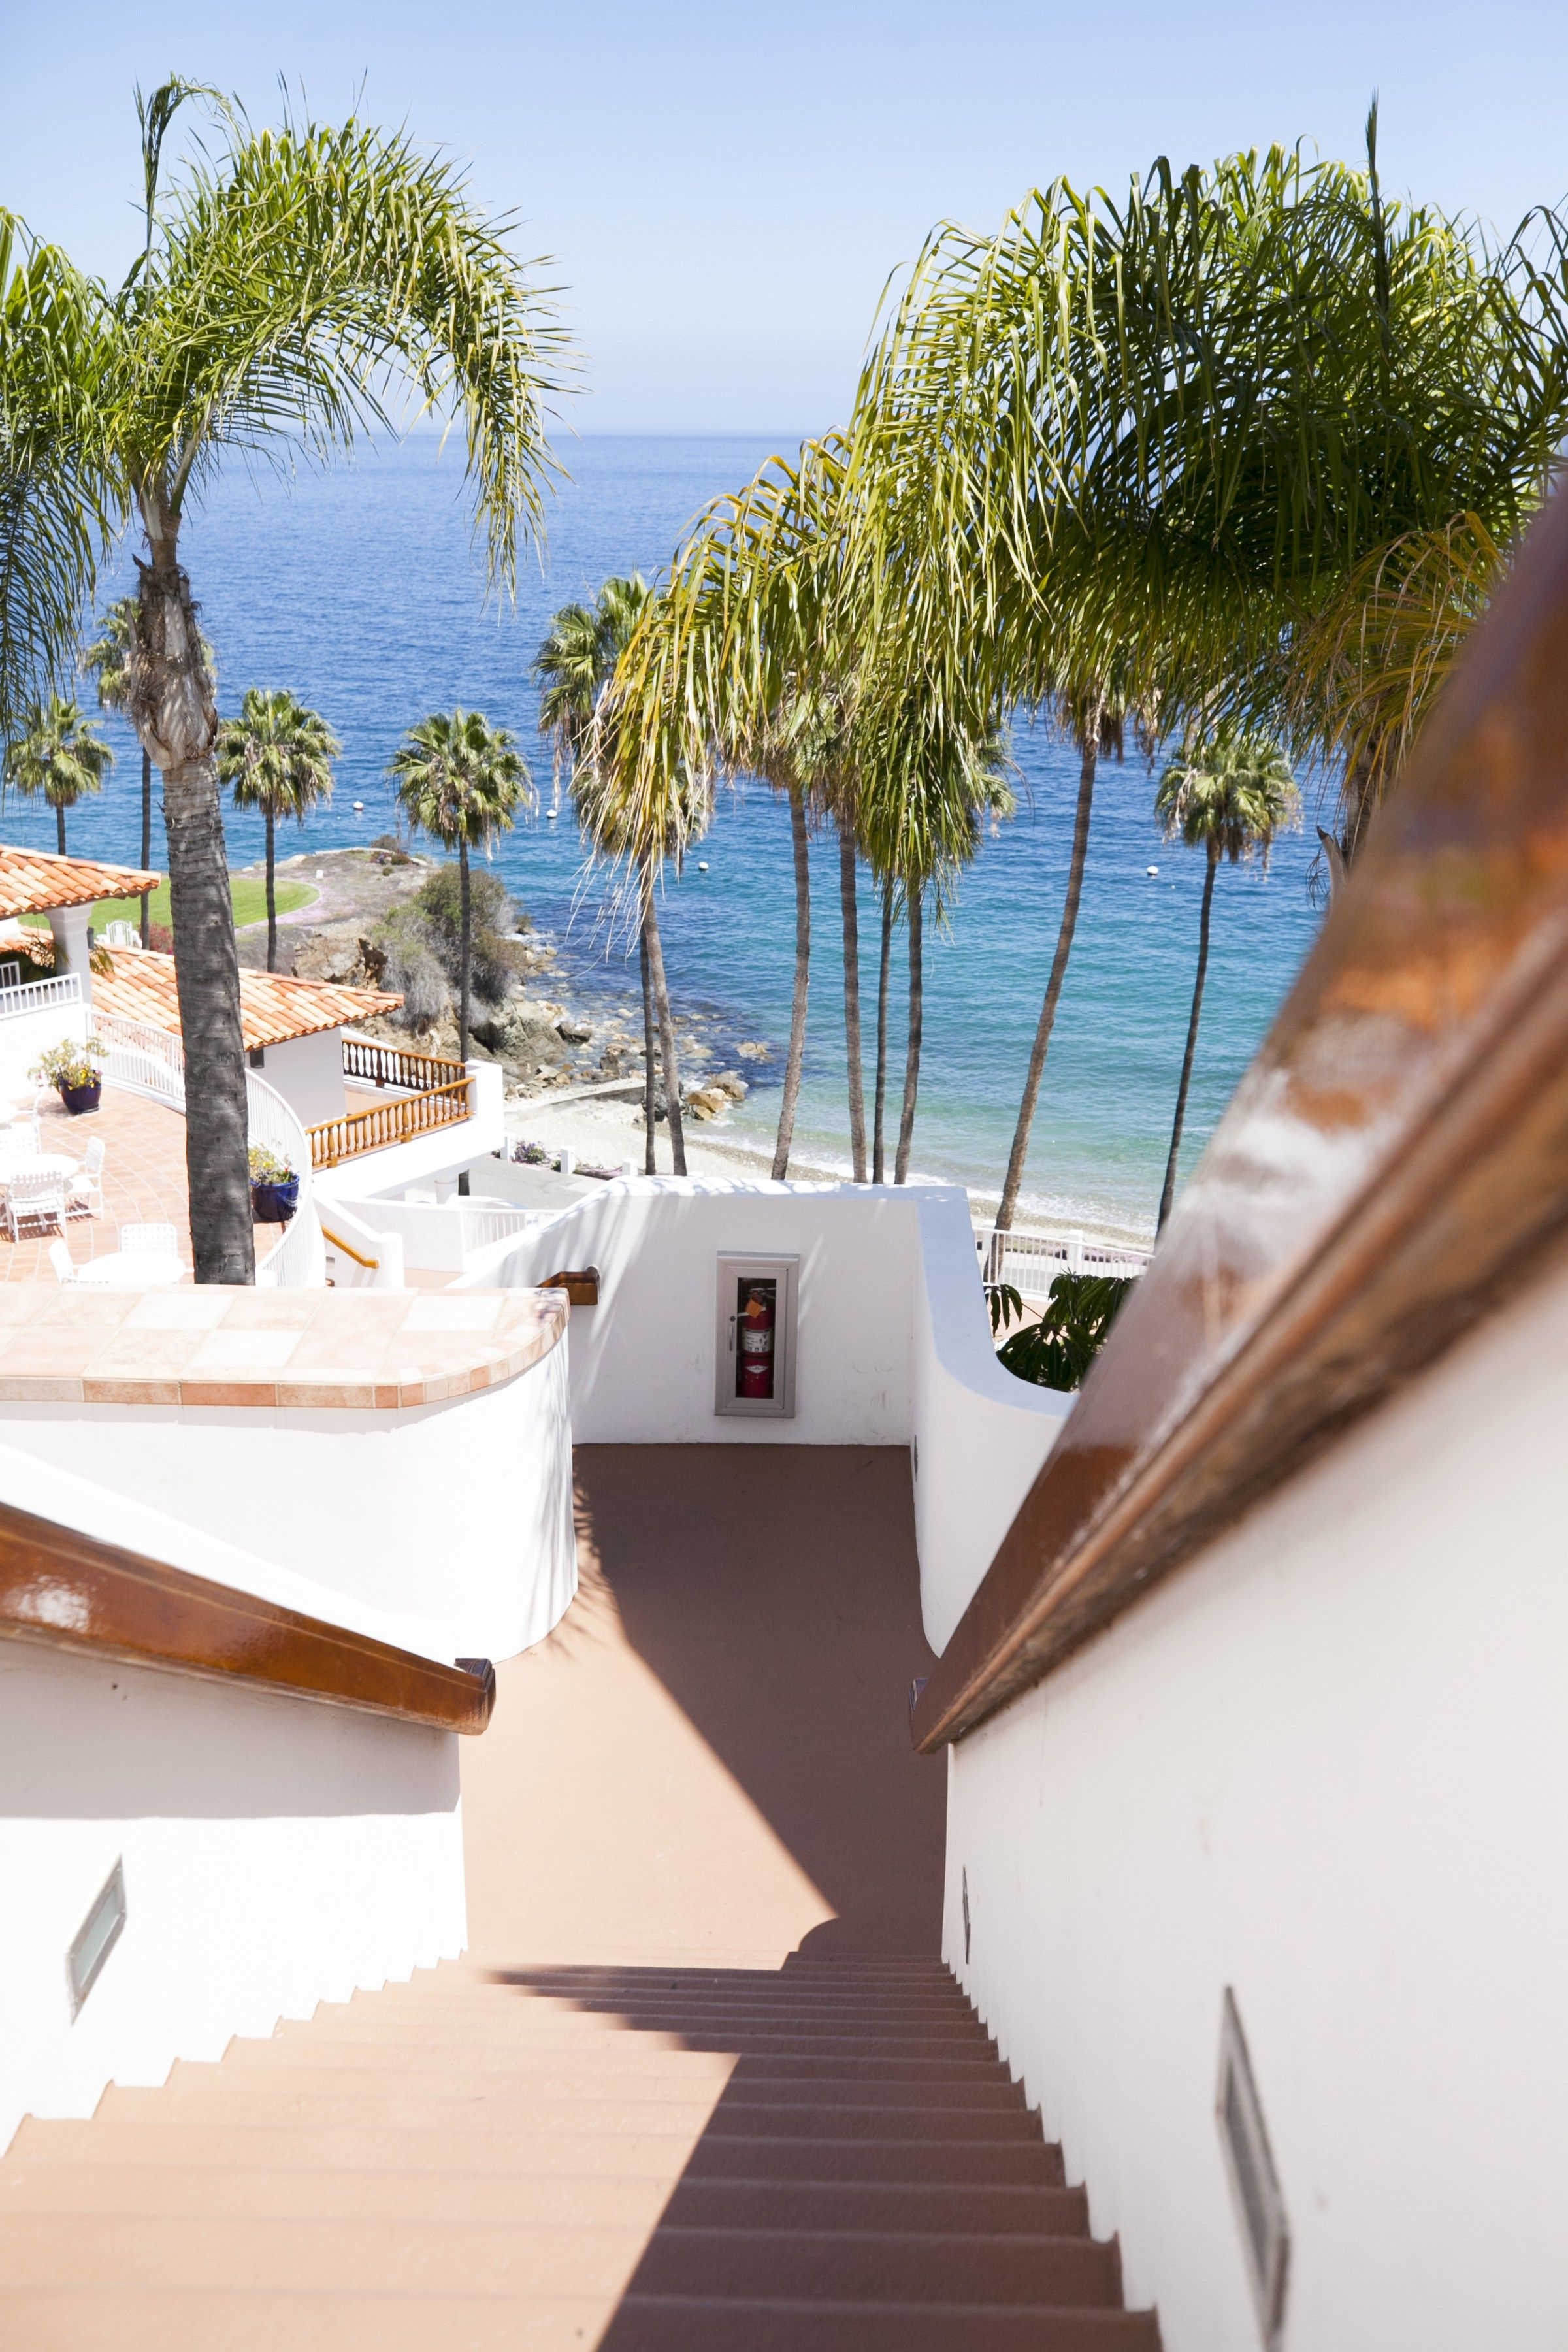 The Ultimate Weekend Getaway To Catalina Island Catalina Island